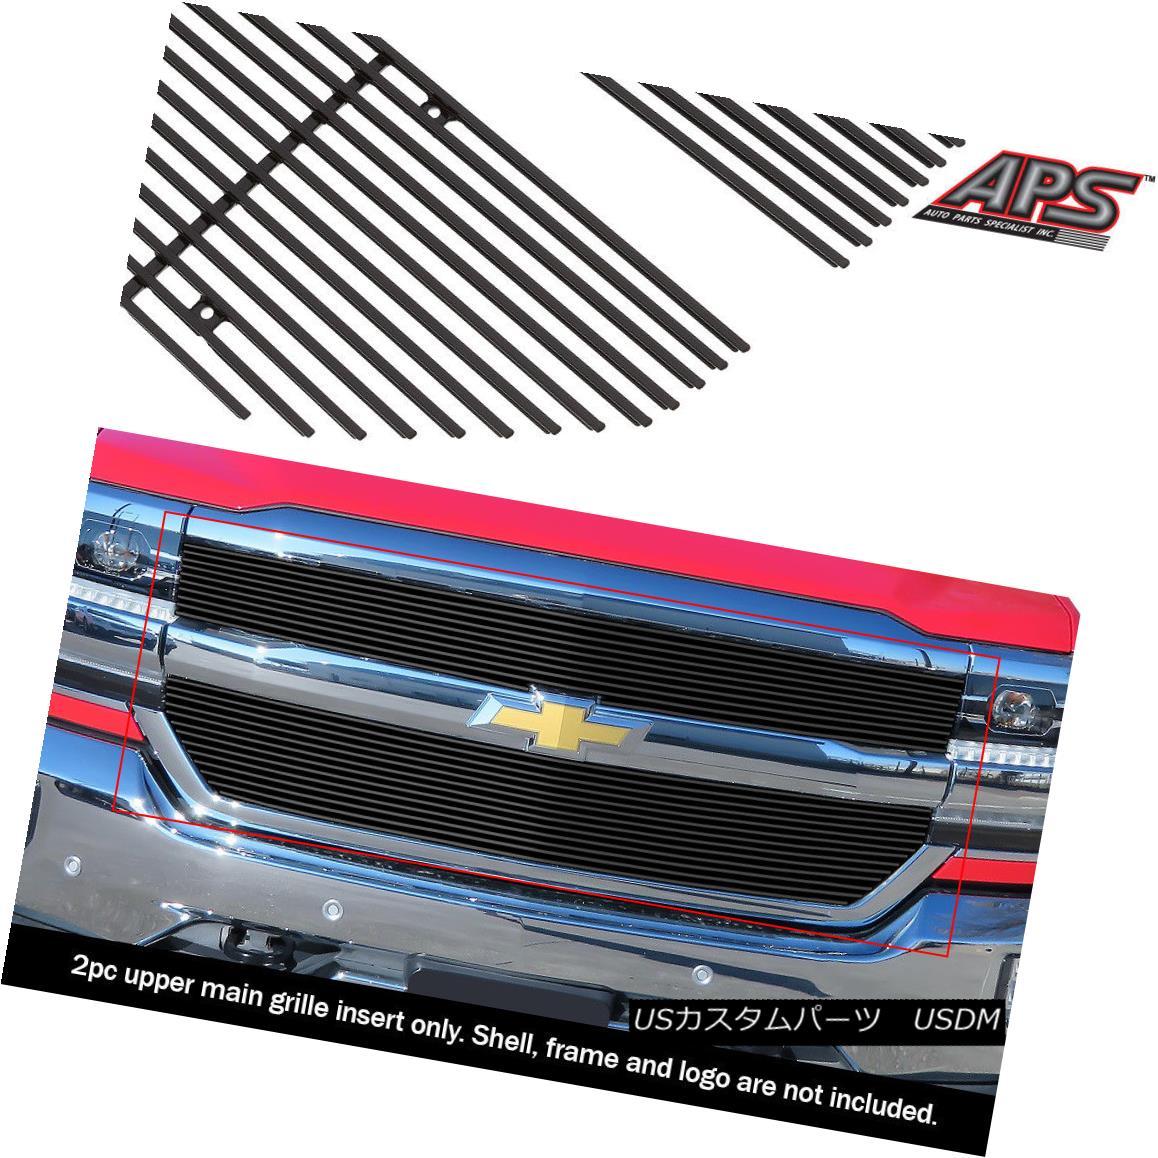 USグリル Fits 2016-2018 Chevy Silverado 1500 Main Upper Black Bille Grille Insert 2016-2018 Chevy Silverado 1500メインアッパーブラックビルグリルインサート